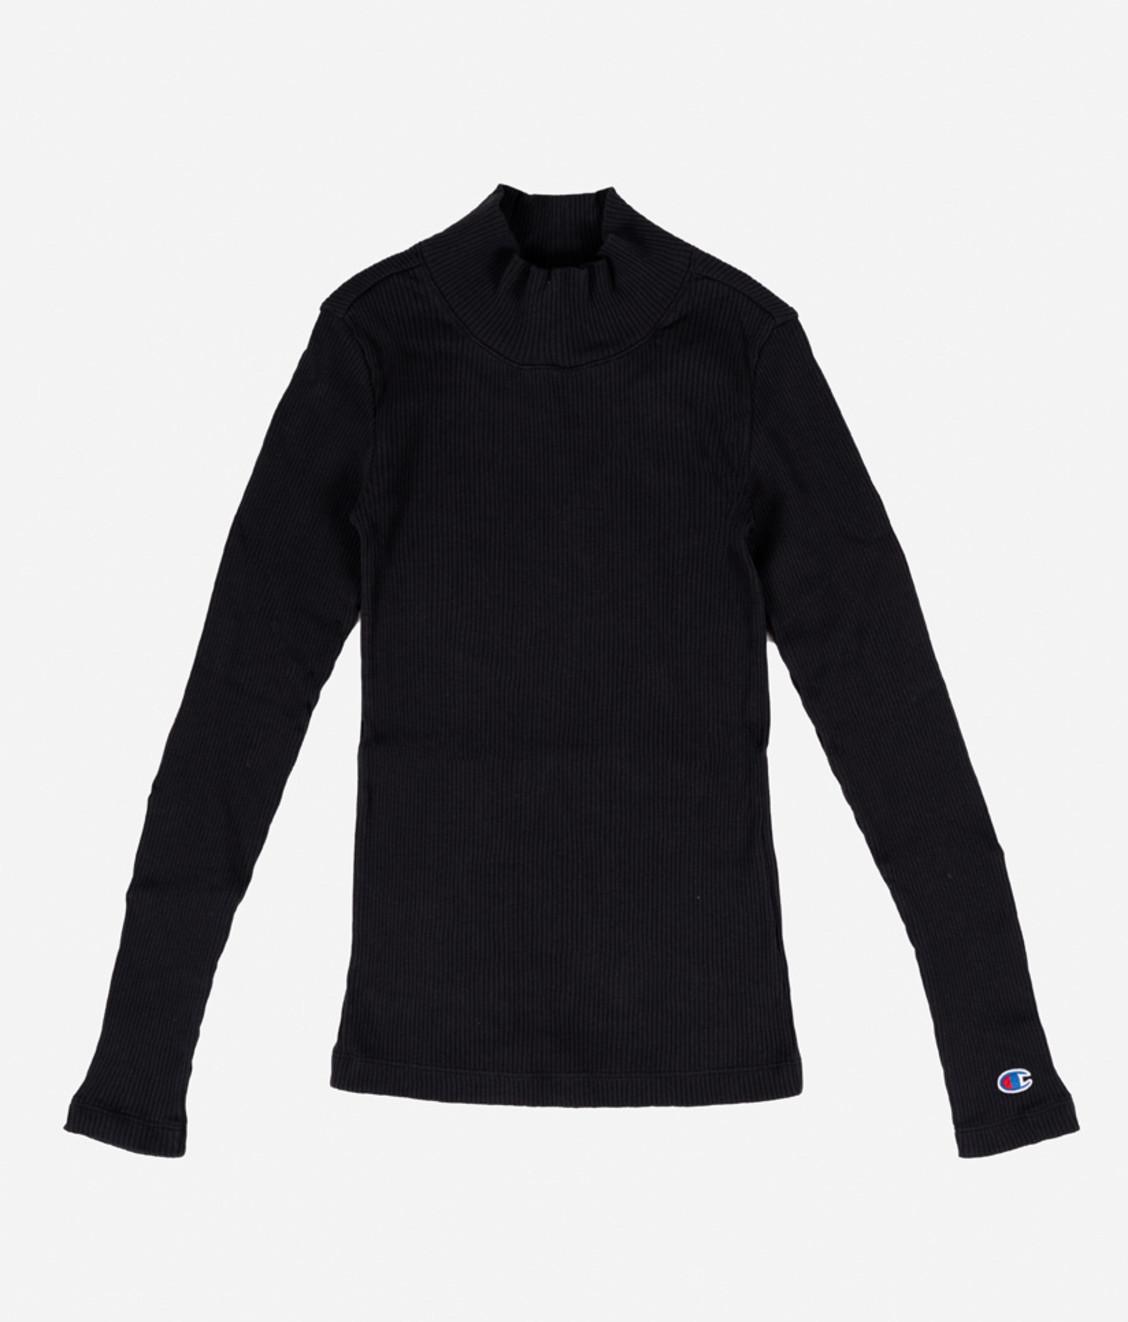 Champion Champion Turtle Neck Long Sleeves T-Shirt Black